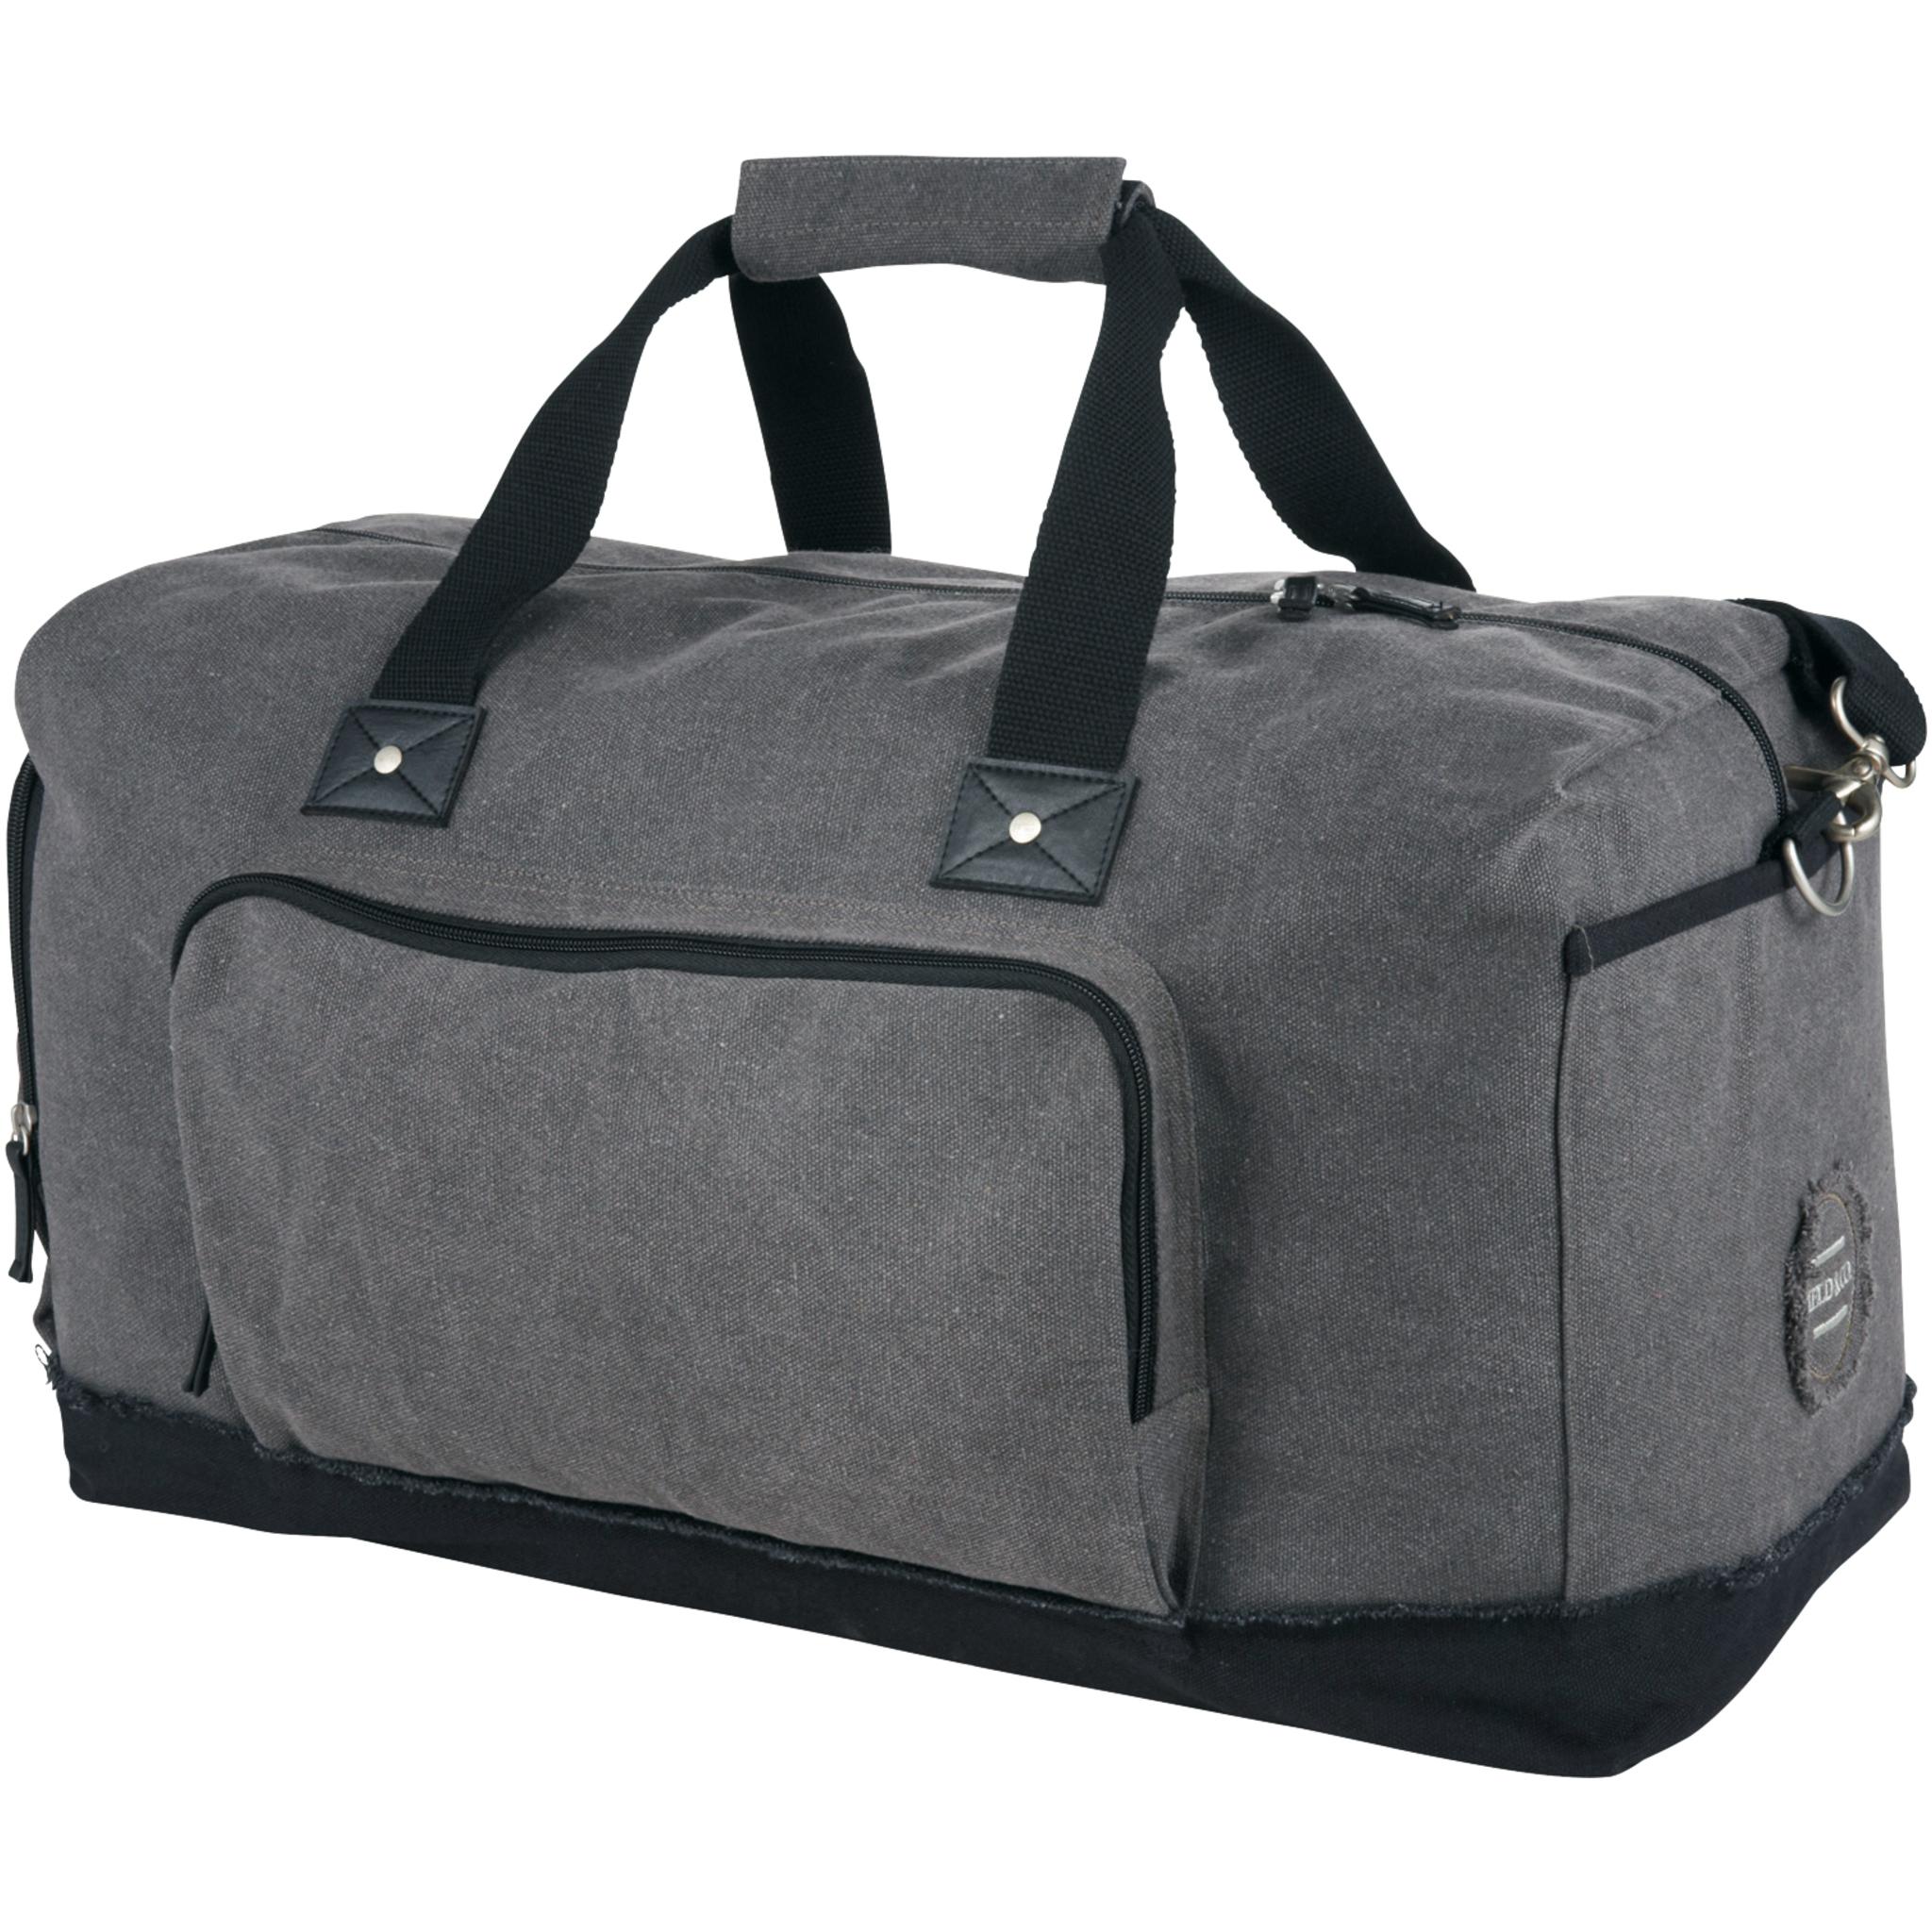 Field & Co. Hudson Weekender Duffel (52.7 x 24.8 x 28.6cm) (Grey/Solid Black)